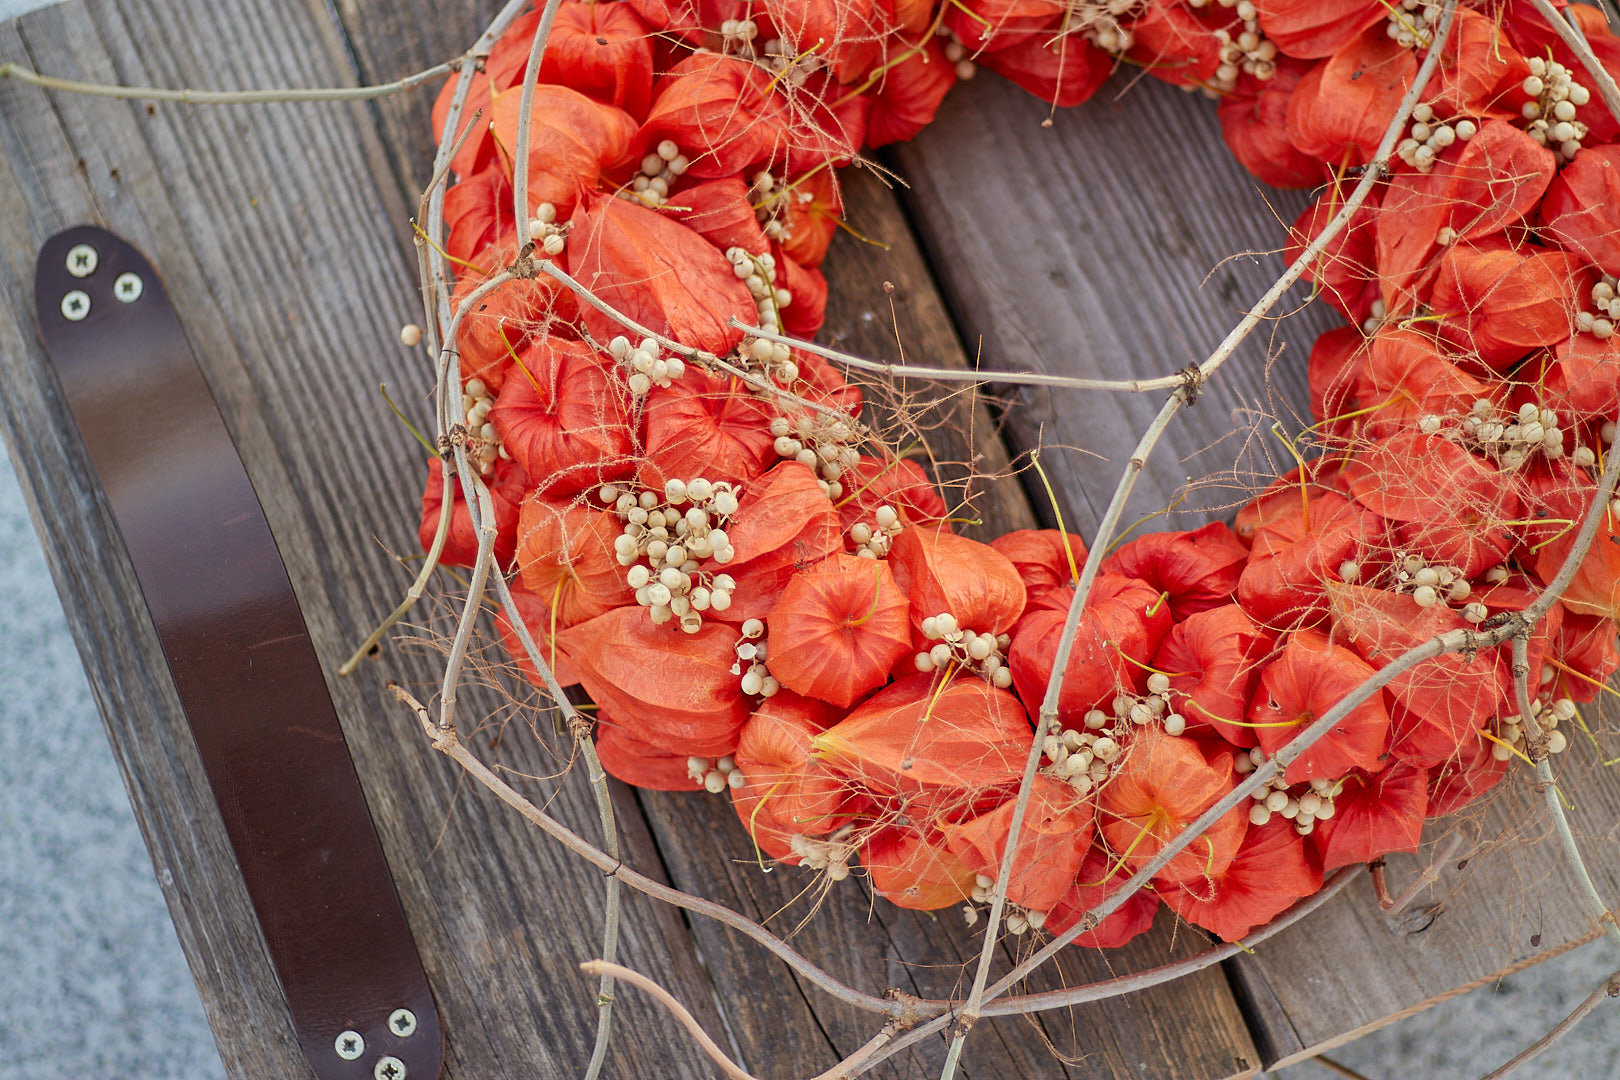 Physalis wreath from Radko Ivanov Chapov